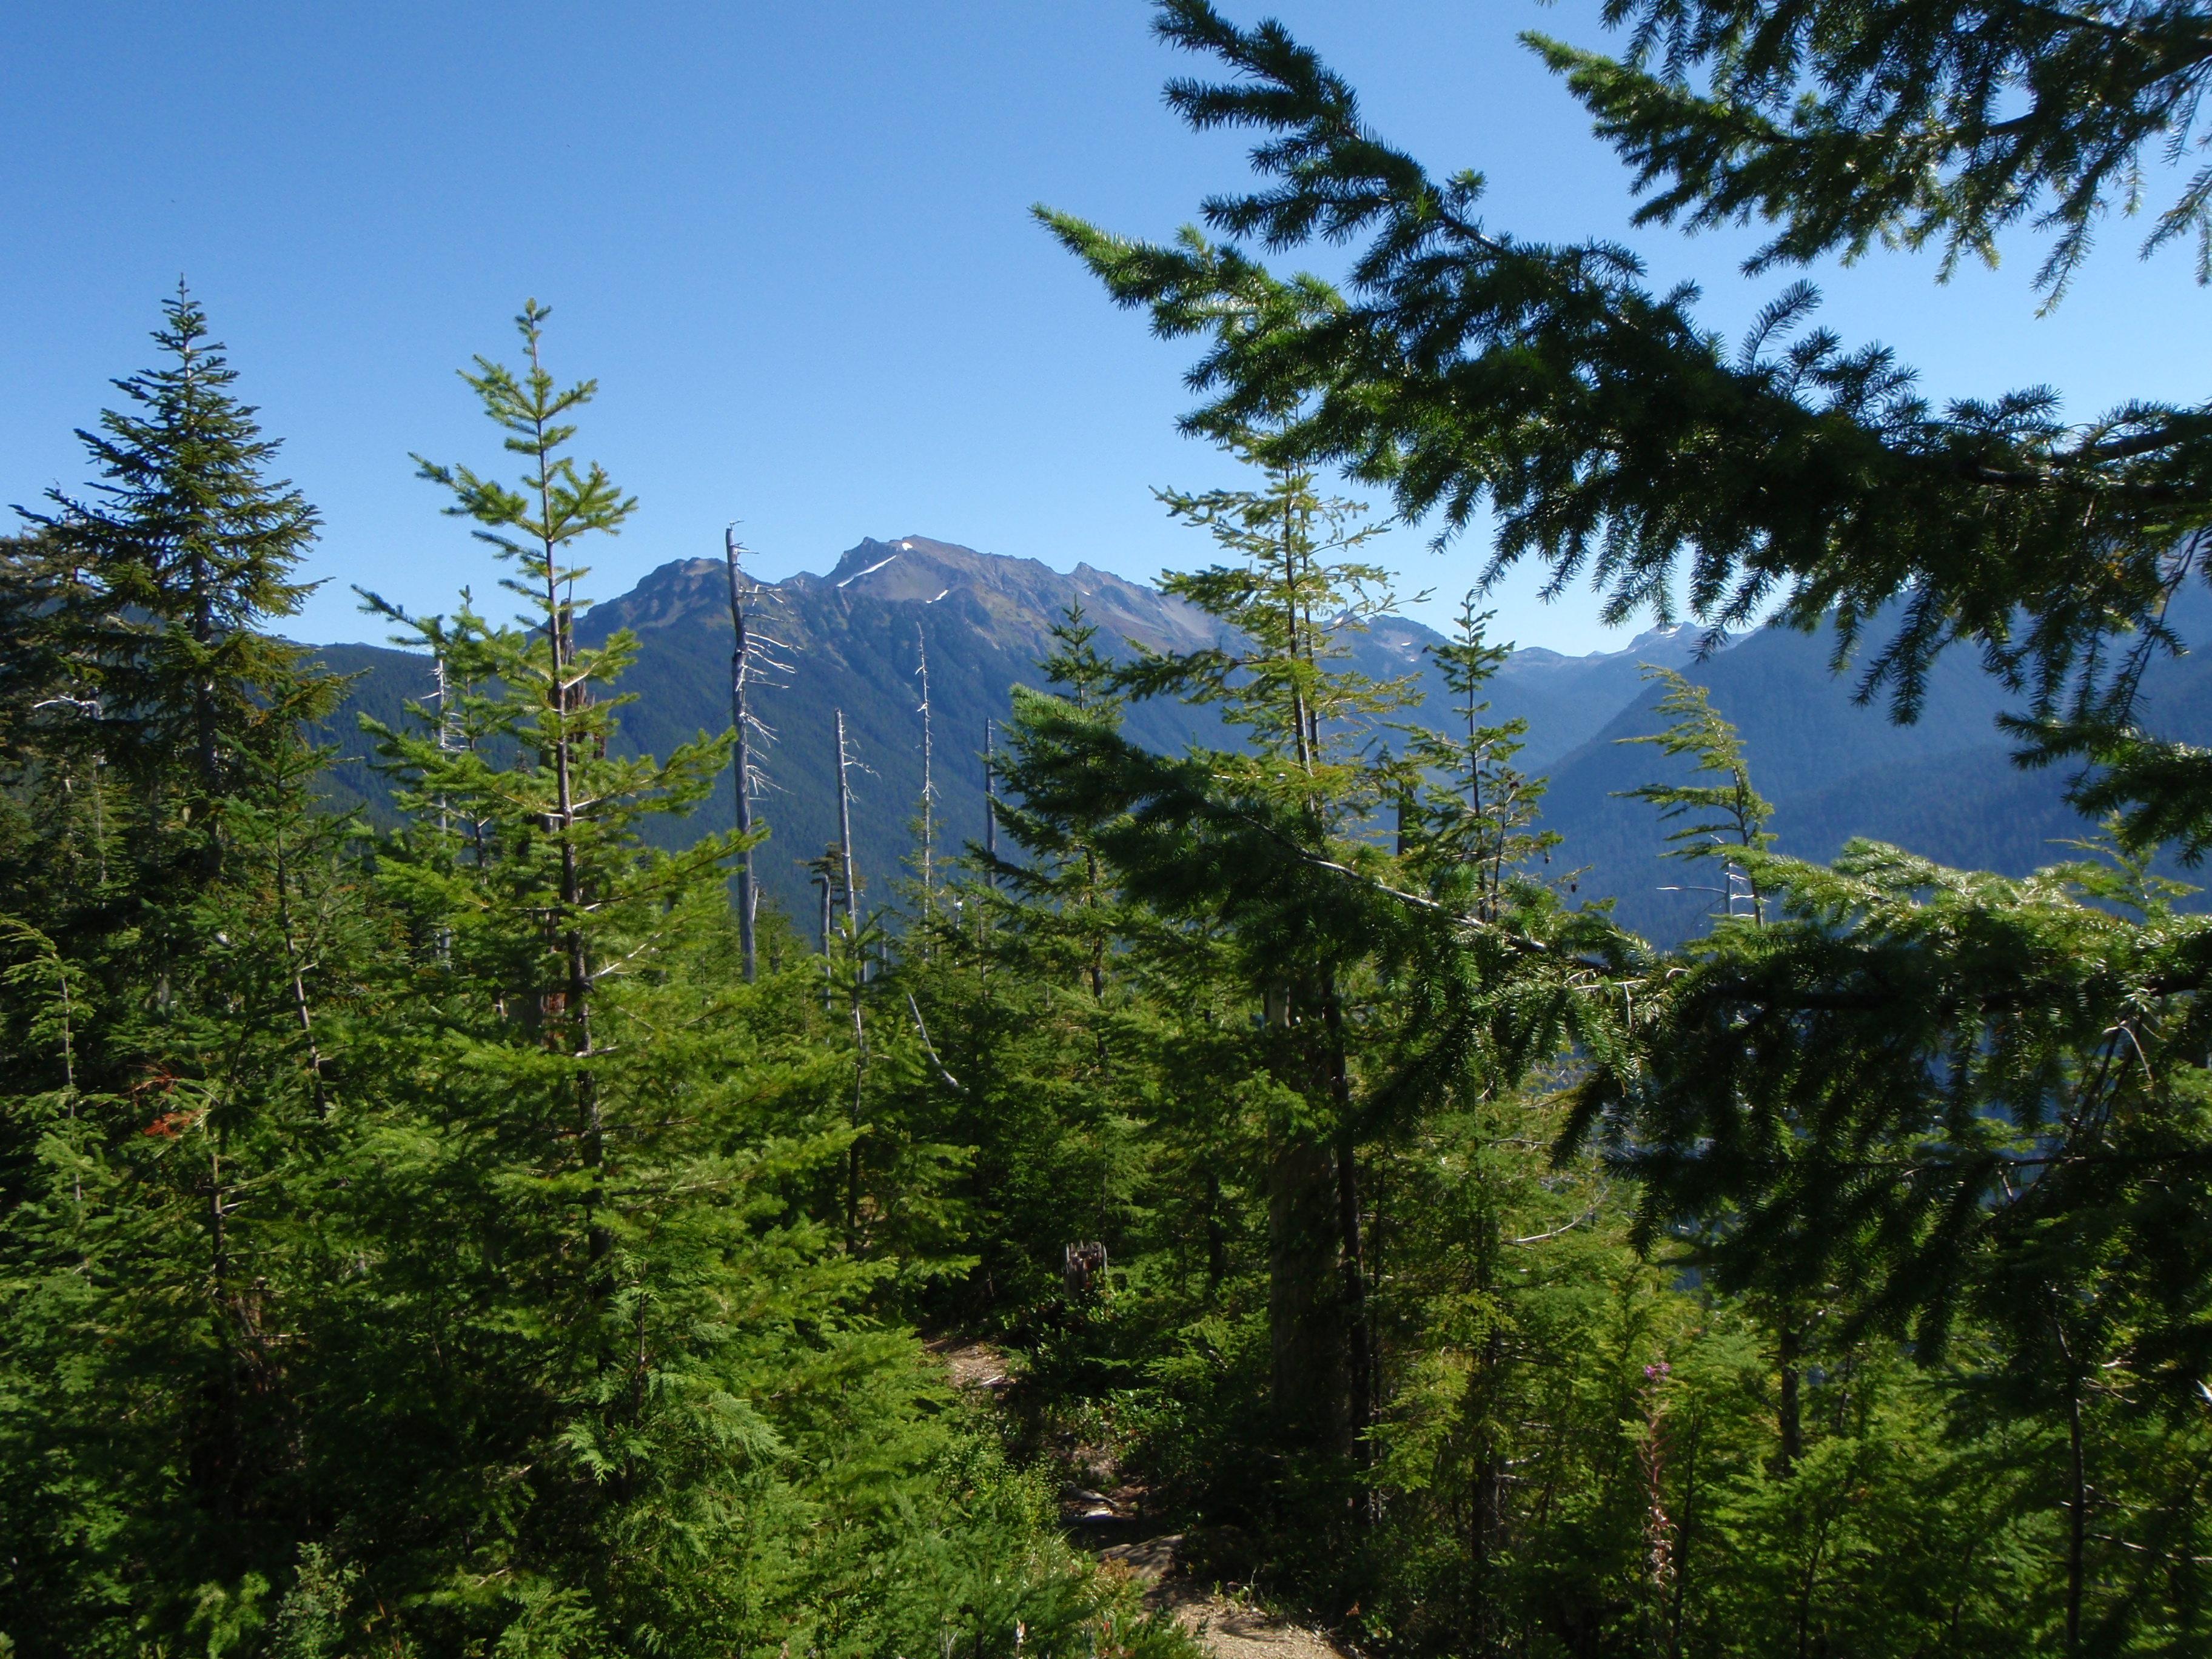 Evergreen trees stock image. Image of hilly, peaks, blue ... |Washington Evergreen Trees